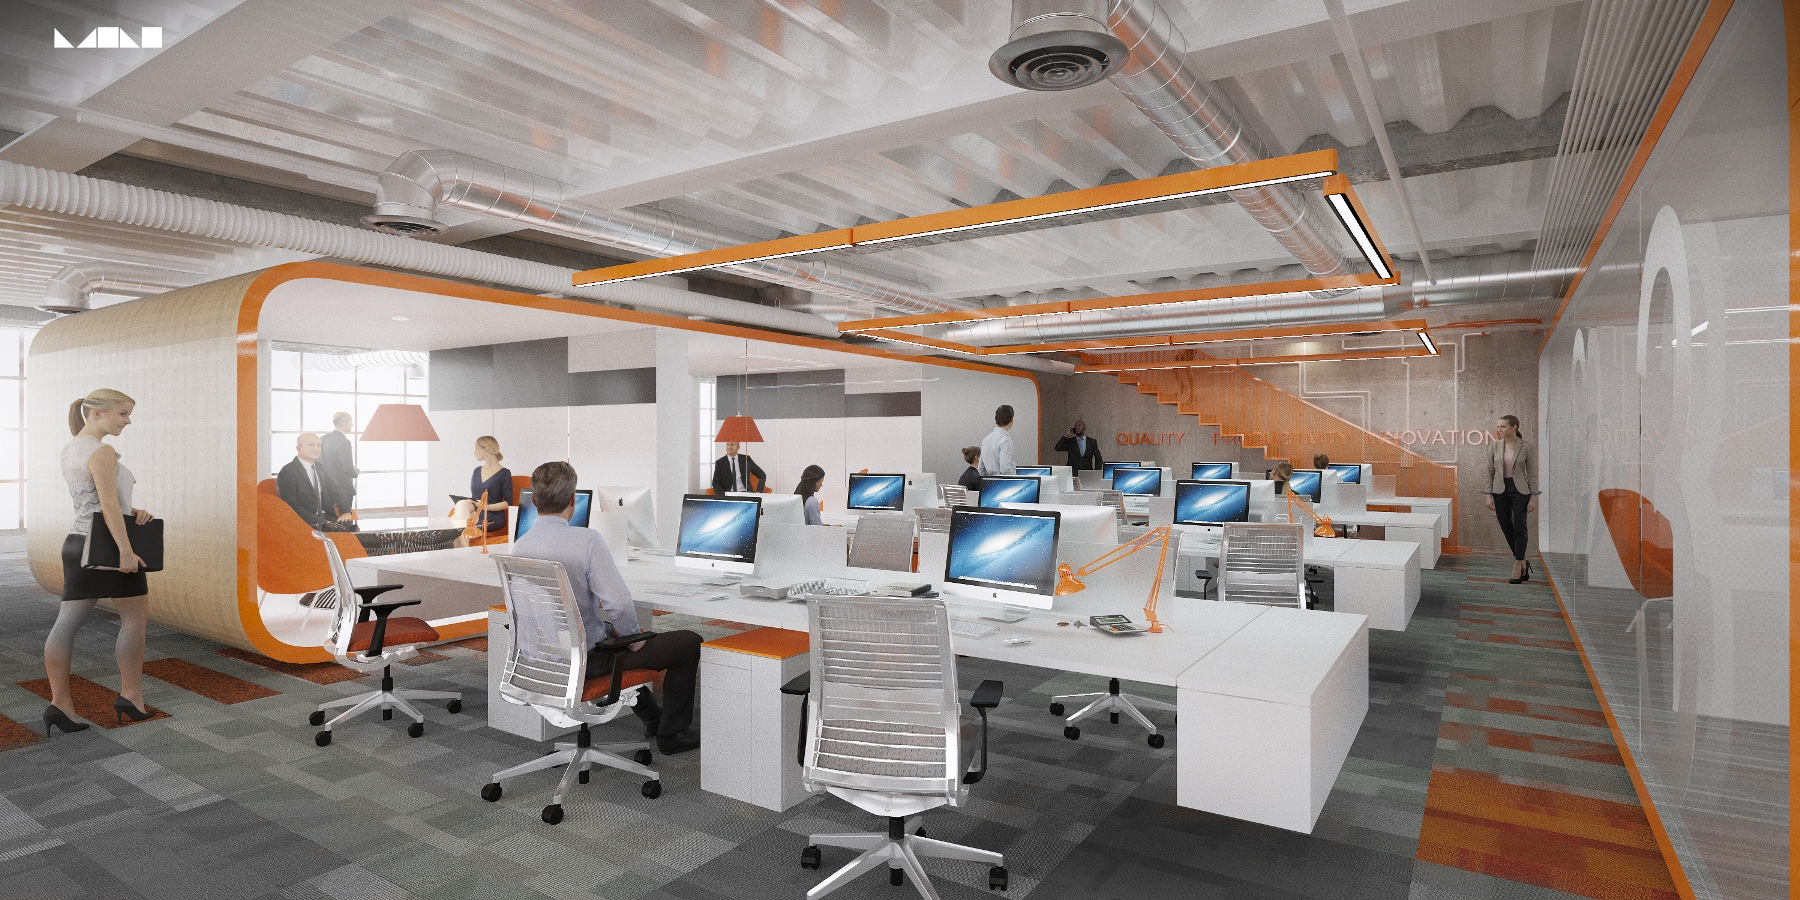 Visualizing architecture - commercial rendering 15 - MONOMO